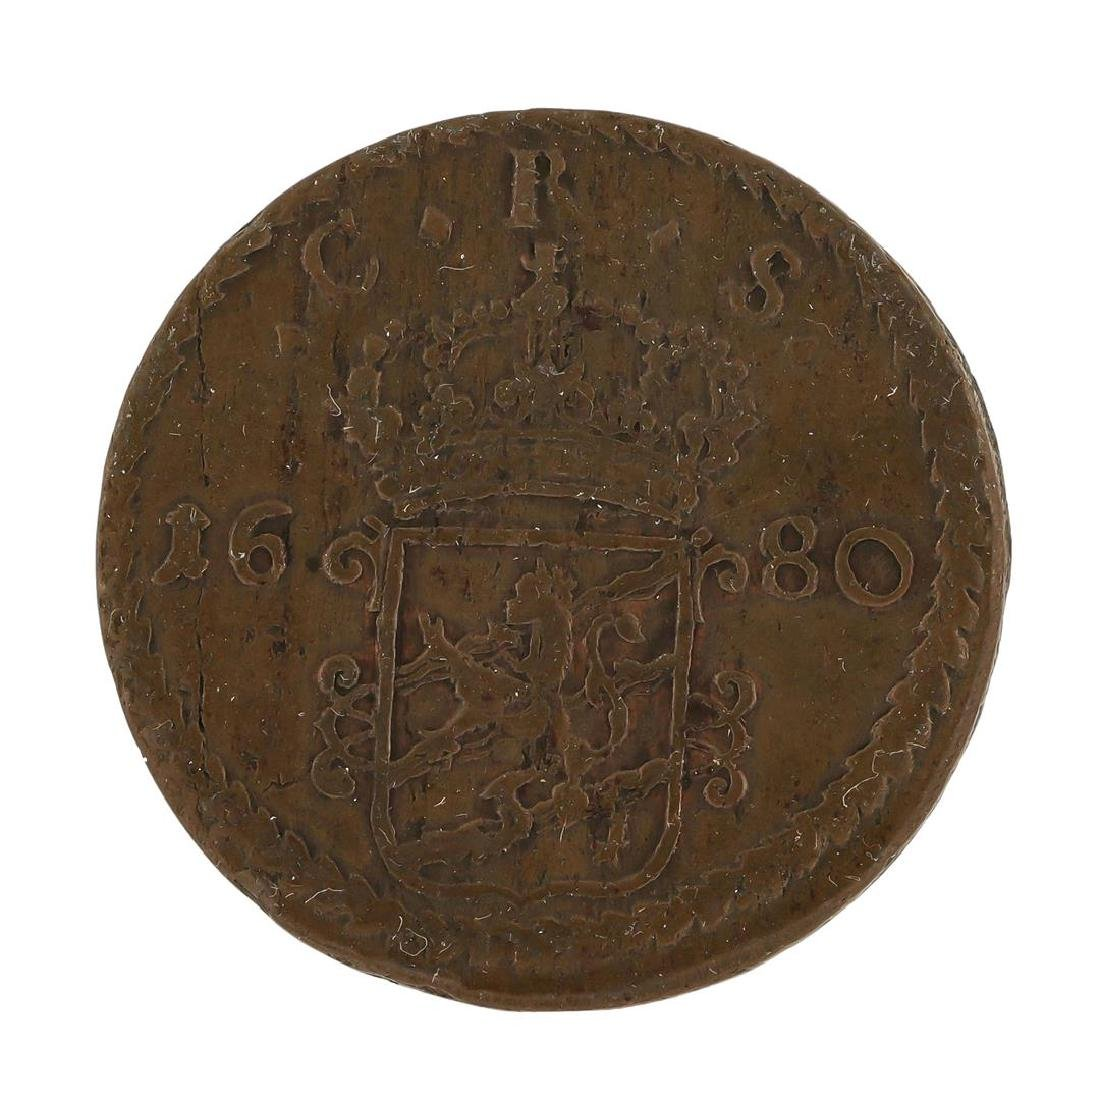 1680 Sweden Medieval Copper Coin KM246A